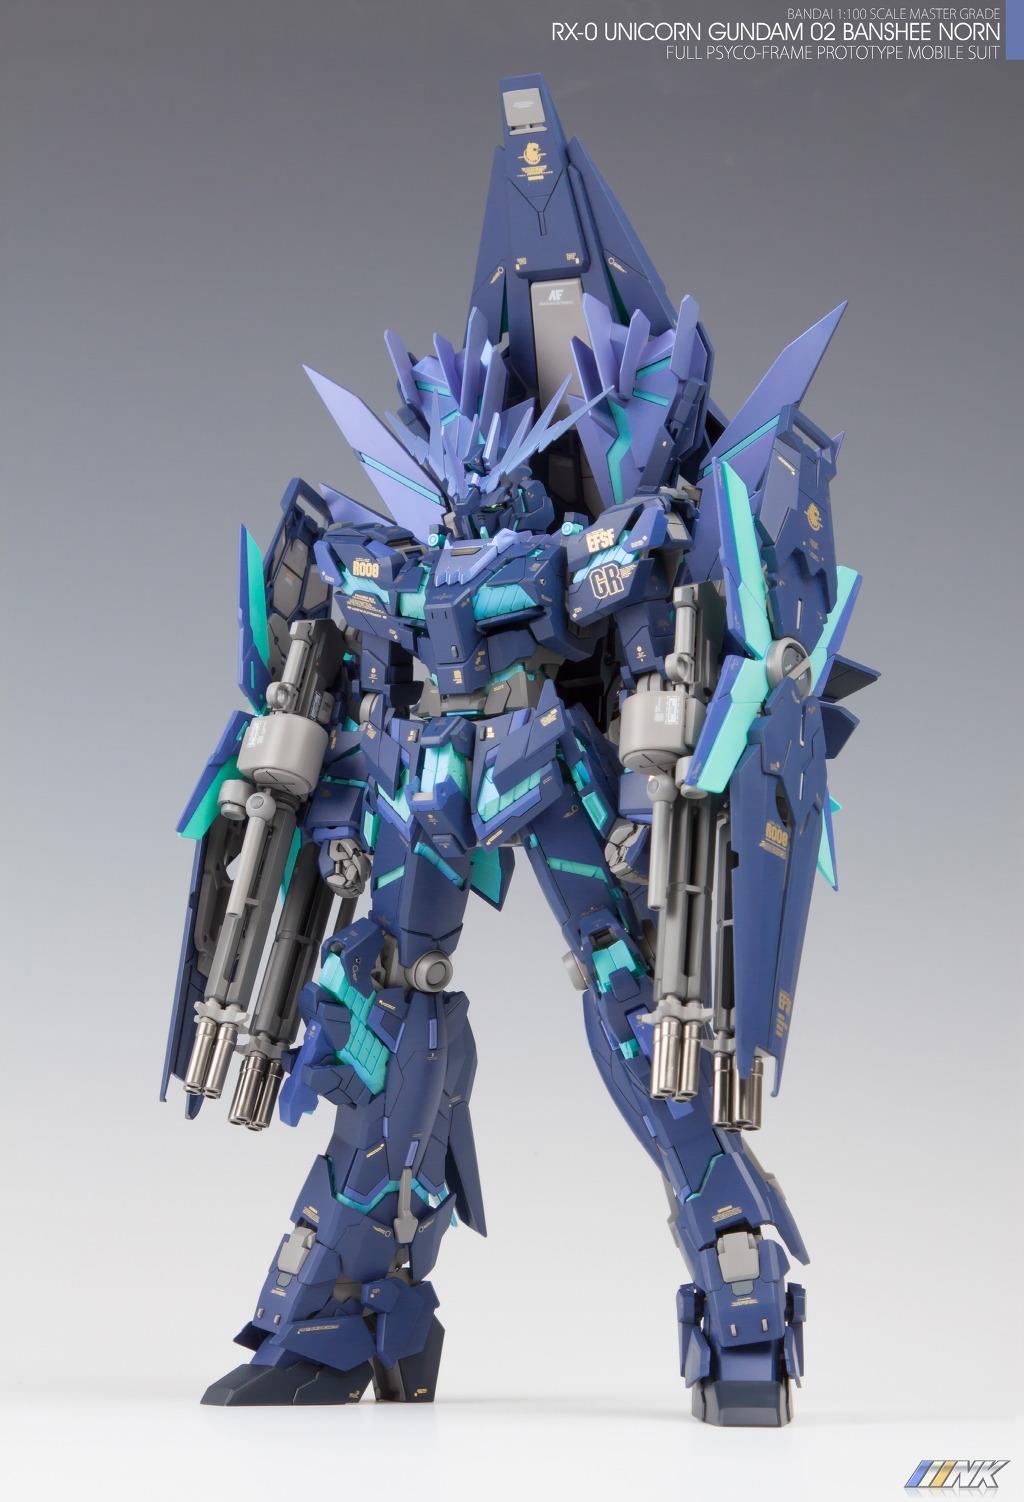 Gundam Guy Mg 1 100 Unicorn Gundam 02 Banshee Norn Painted Build